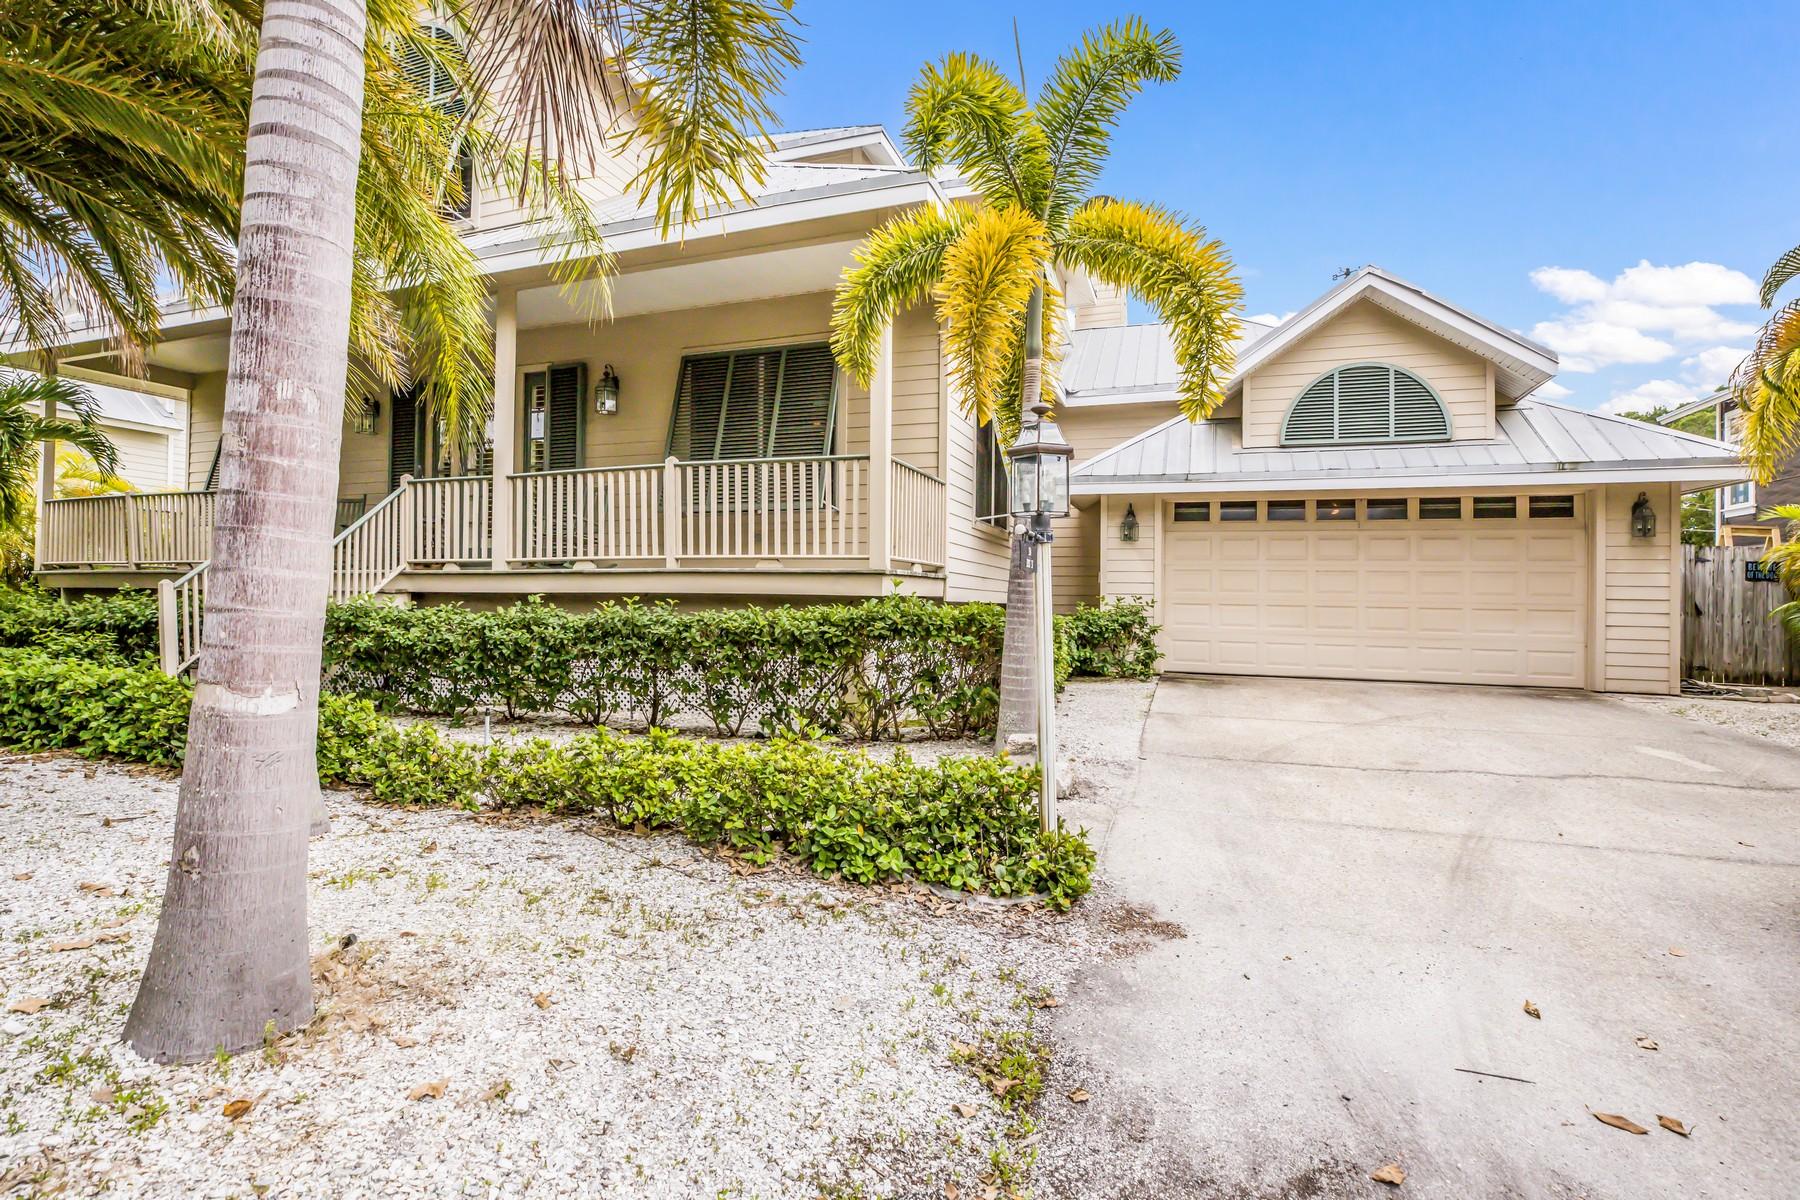 Single Family Homes for Sale at 154 1st Street E Boca Grande, Florida 33921 United States